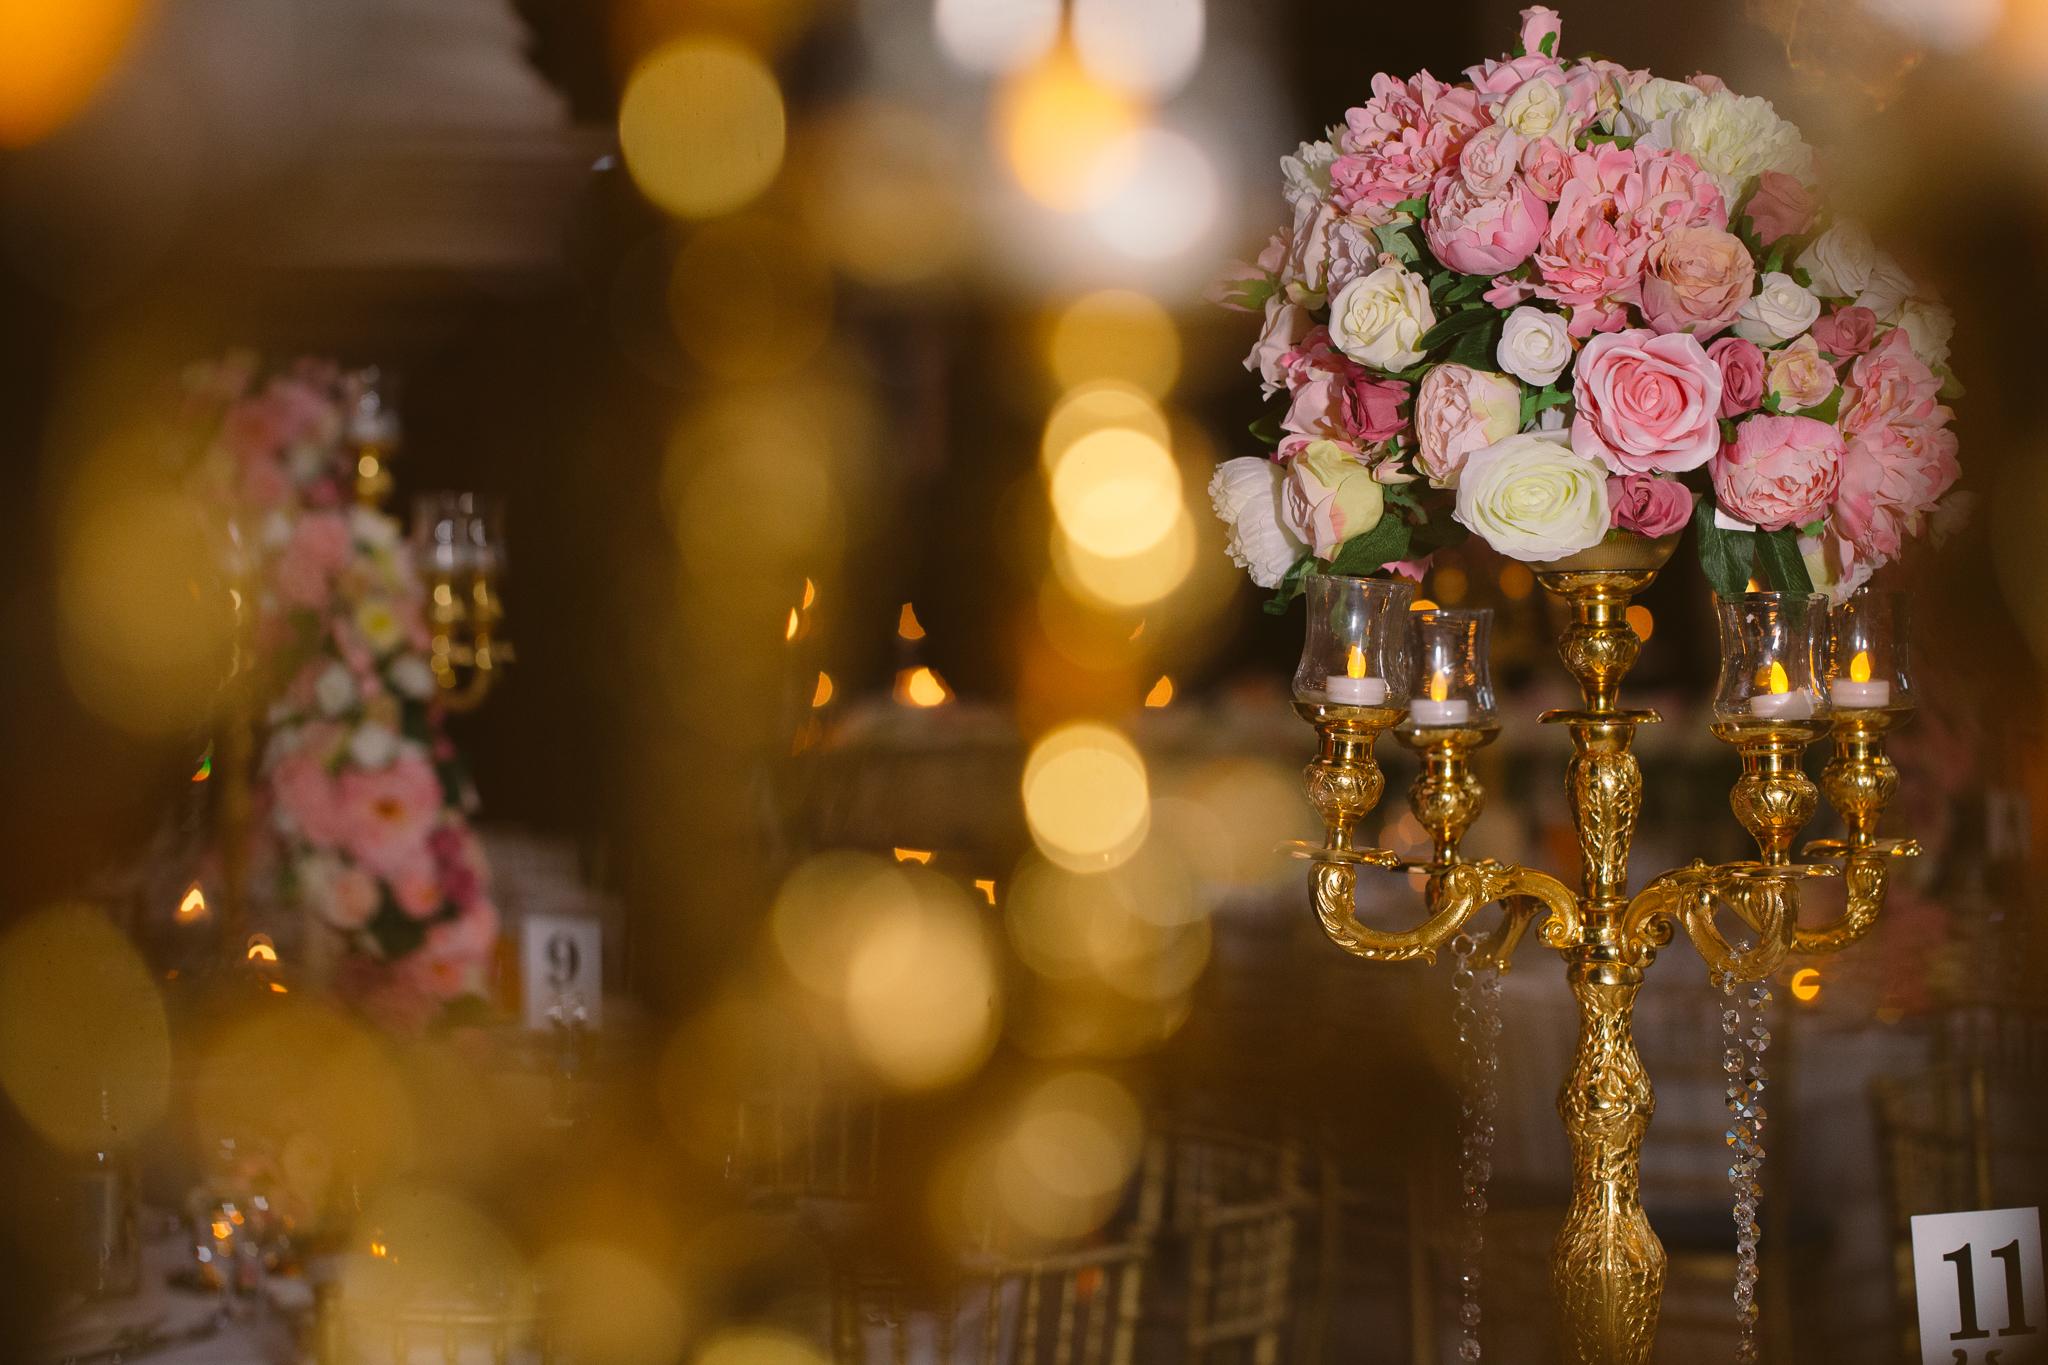 Asian-wedding-photographer-london-birmingham-Zohaib Ali11.jpg